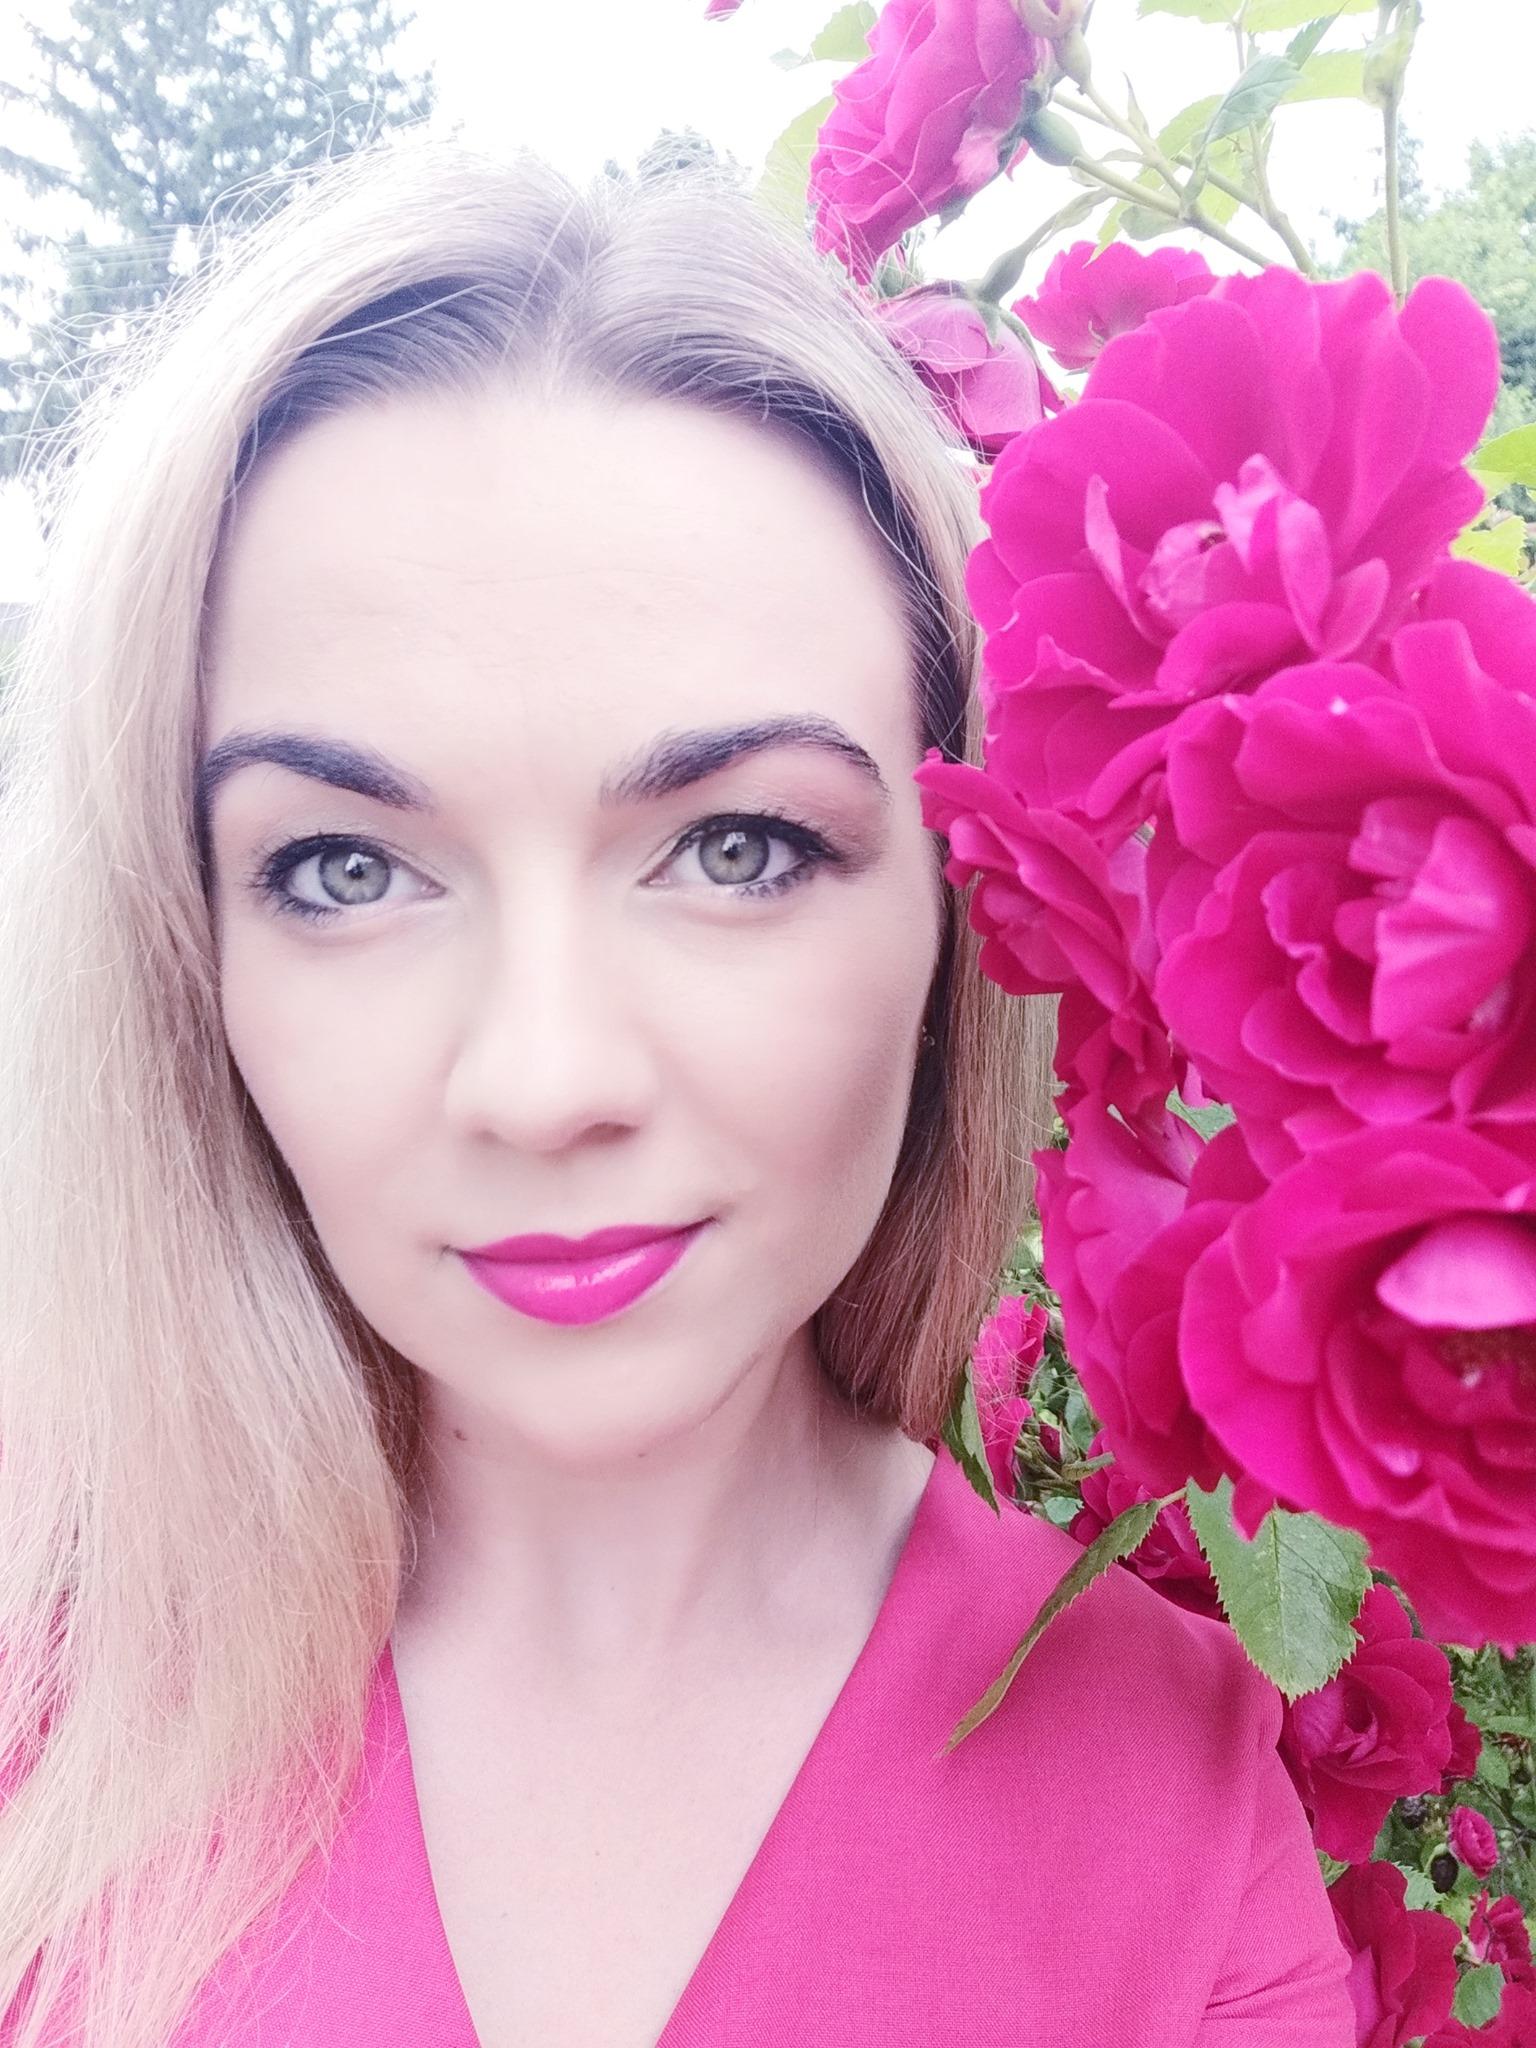 Małgorzata Ronduda